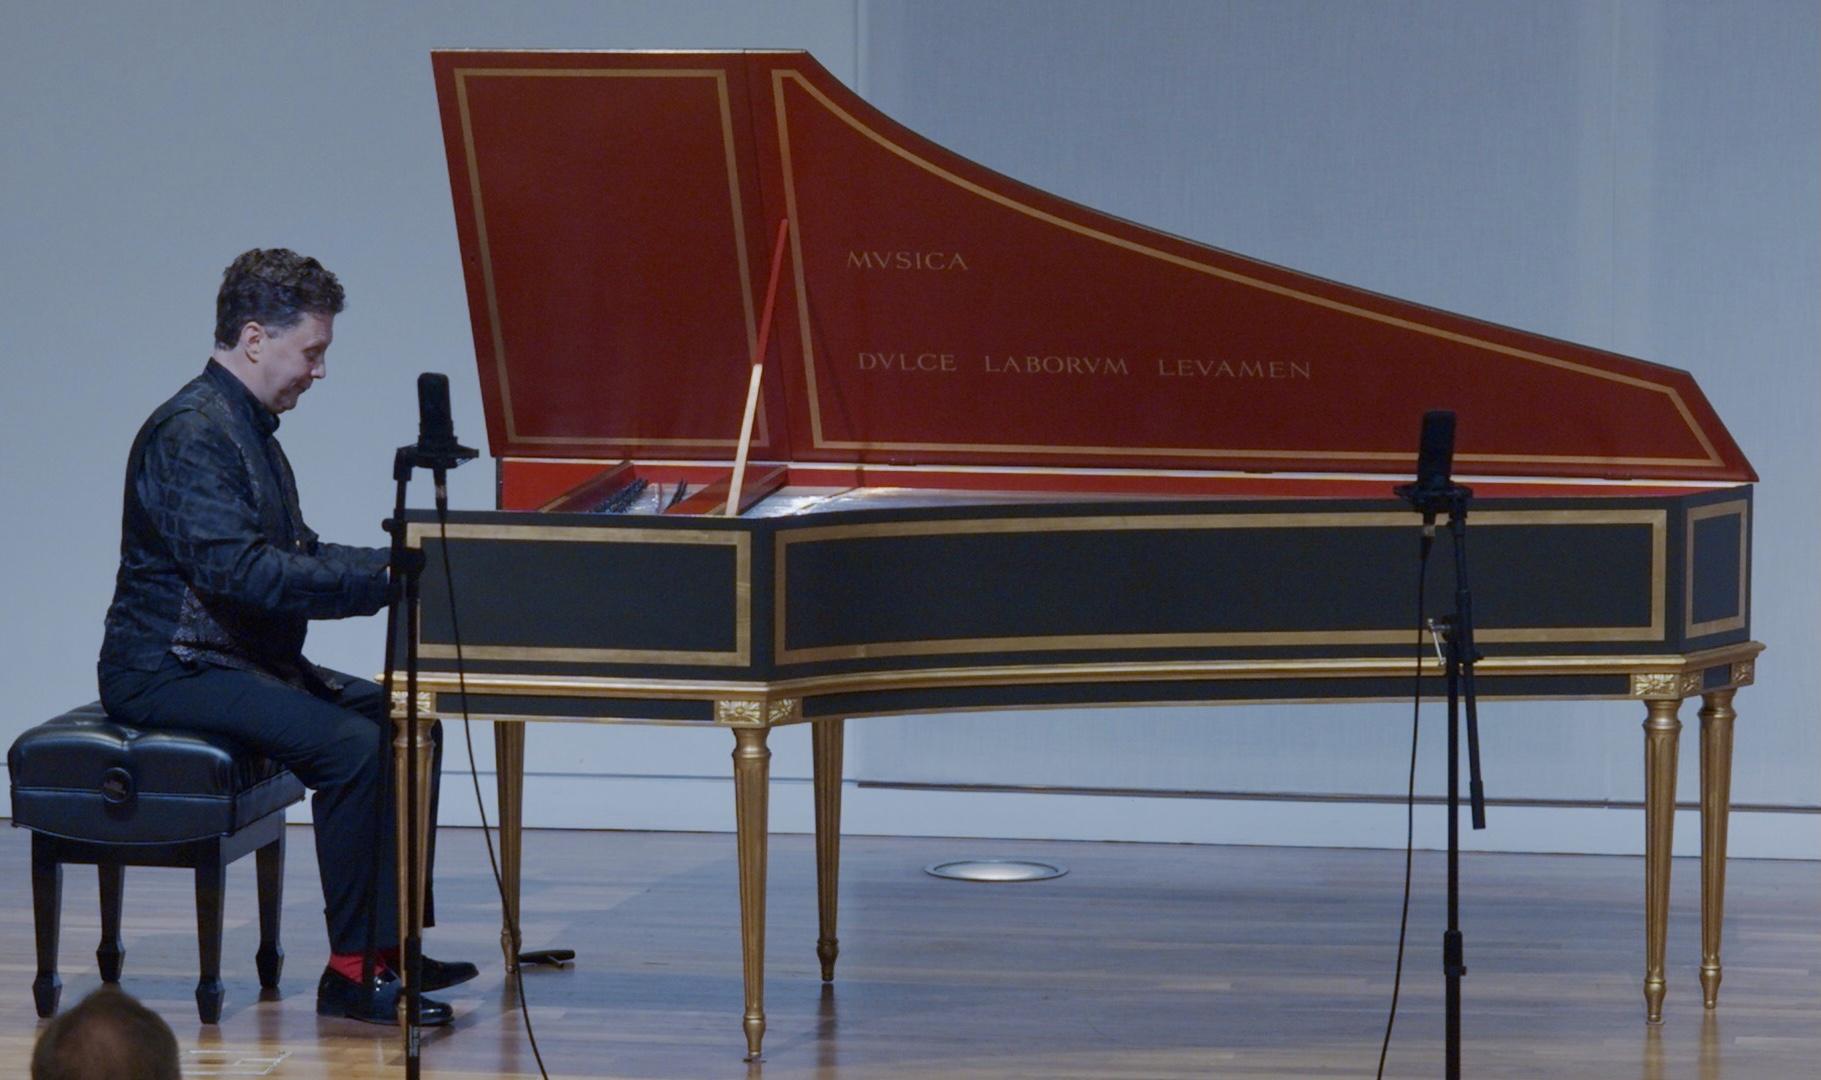 IN REVIEW: harpsichordist JORY VINIKOUR in recital with Capriccio Baroque, 18 September 2021 [Photograph © by Capriccio Baroque; used with permission]